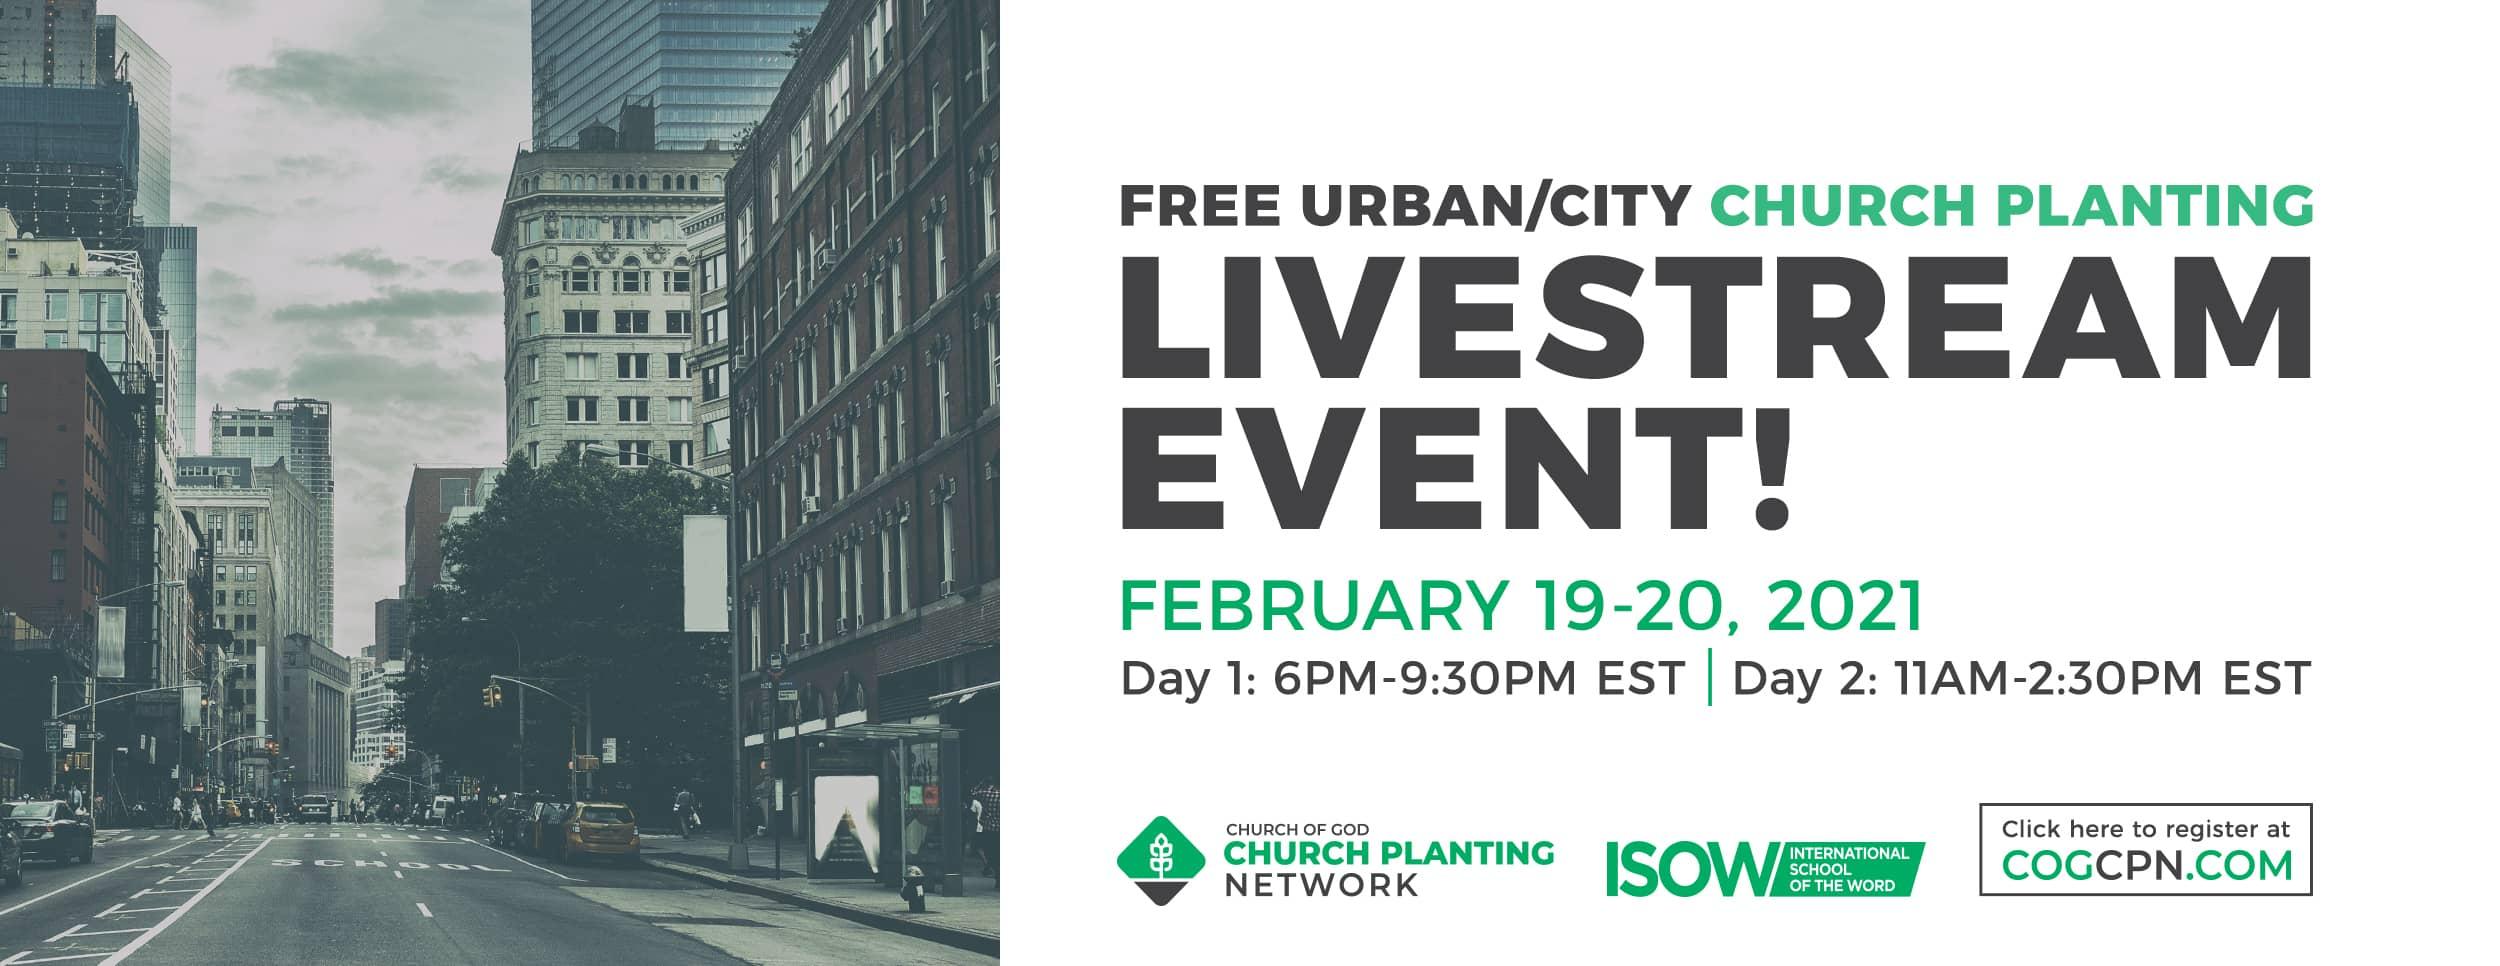 Free Urban Church Planting Livestream 2/19 - 2/20, Online Bible study course